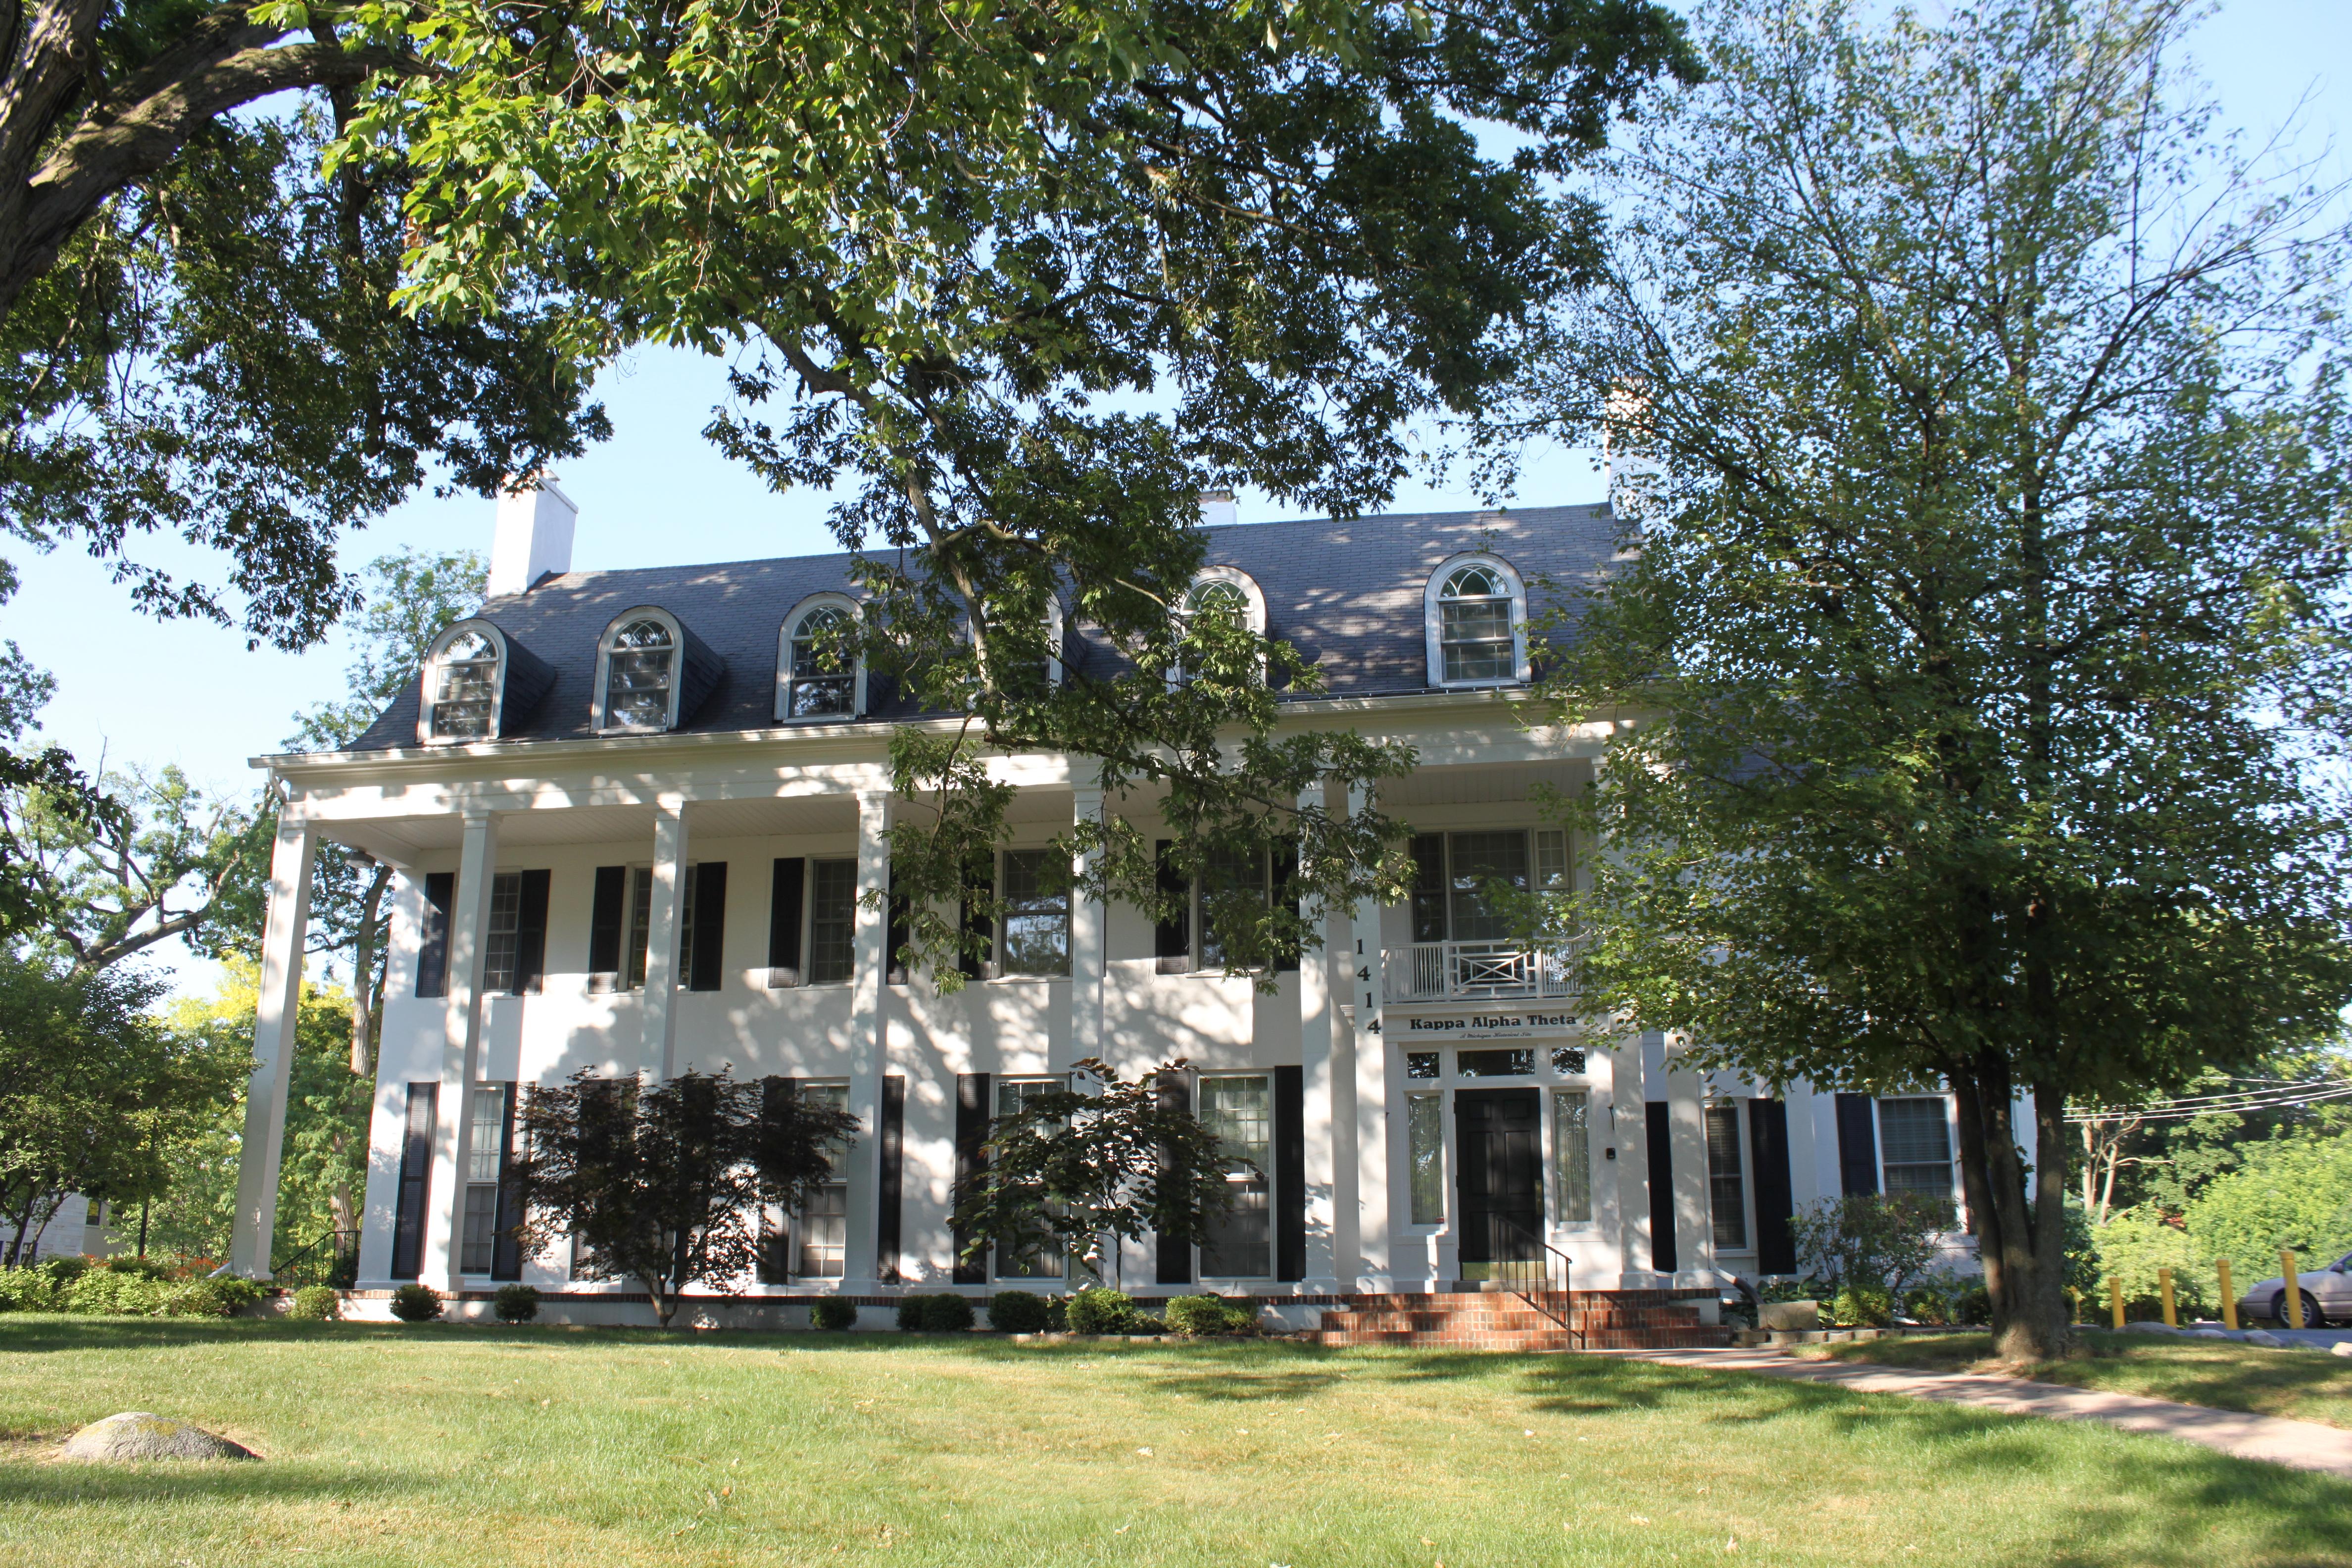 File:Kappa Alpha Theta Fraternity House Ann Arbor Michigan.JPG ...